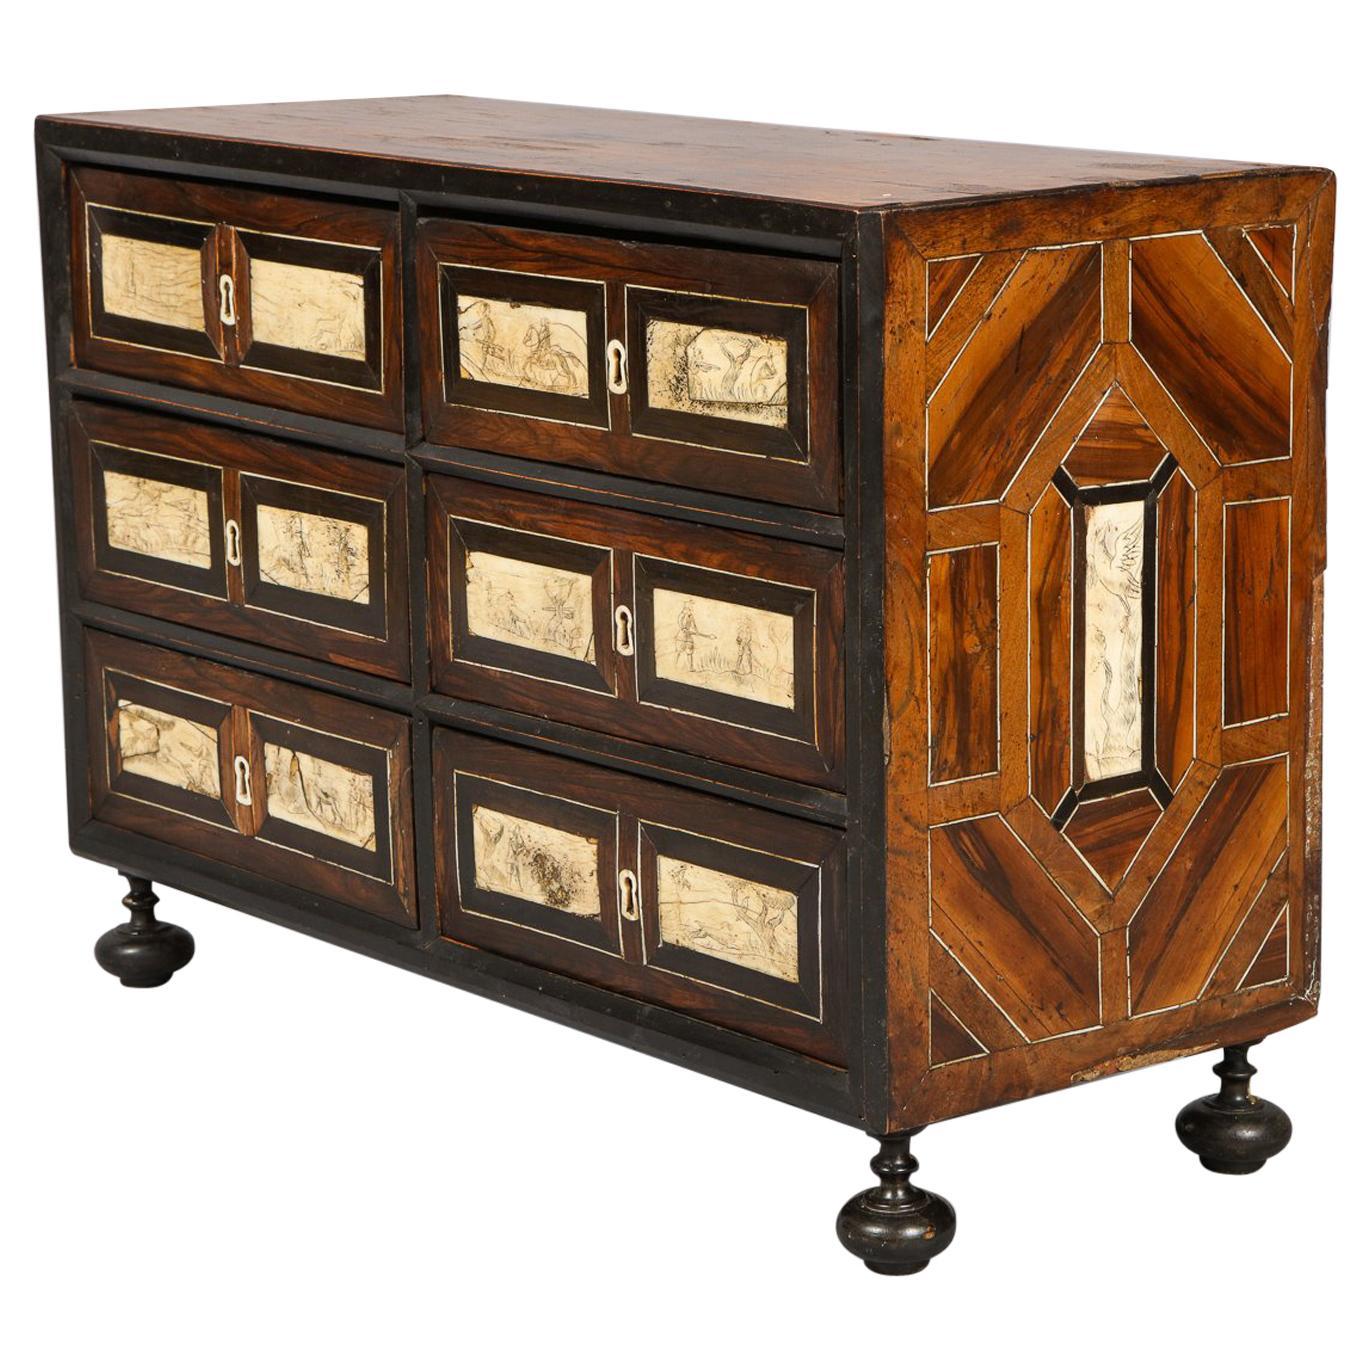 Italian Baroque Inlaid Cabinet